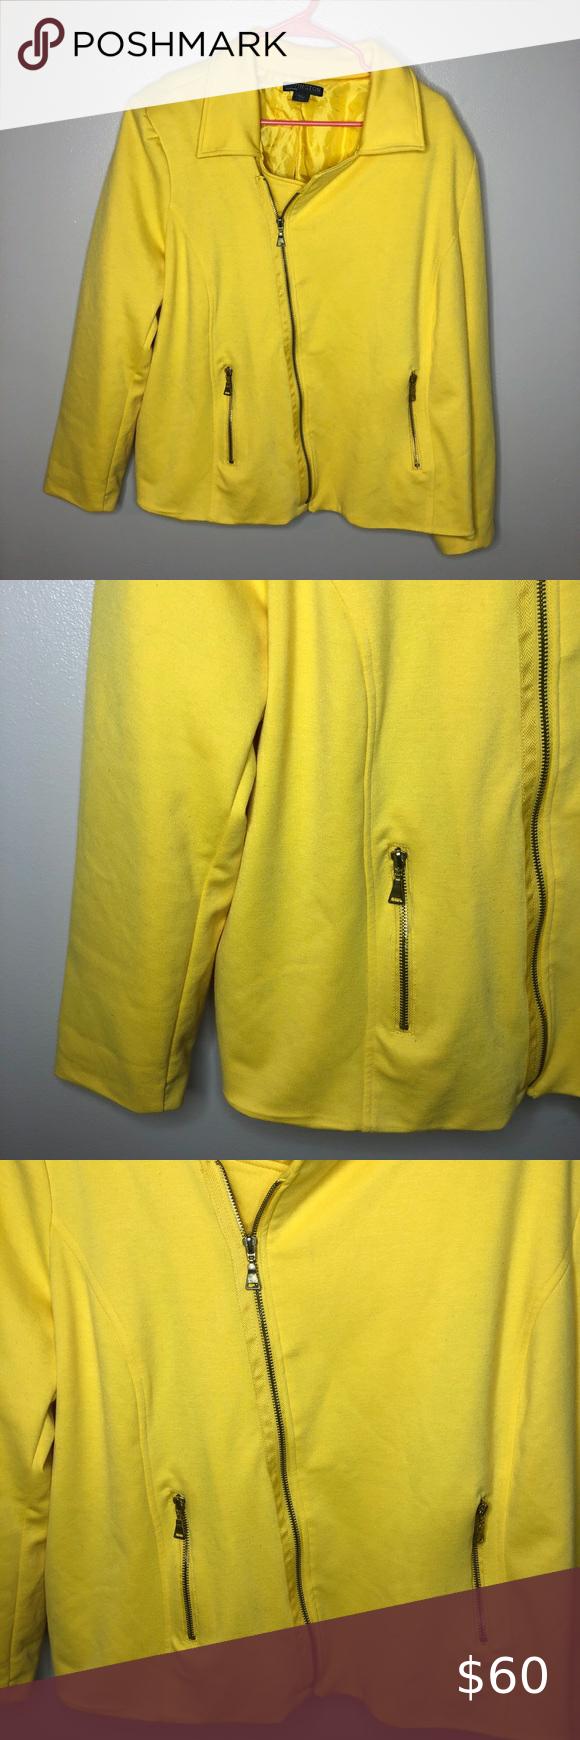 Covington Yellow Jacket Jackets Jacket Brands Wool Winter Jacket [ 1740 x 580 Pixel ]